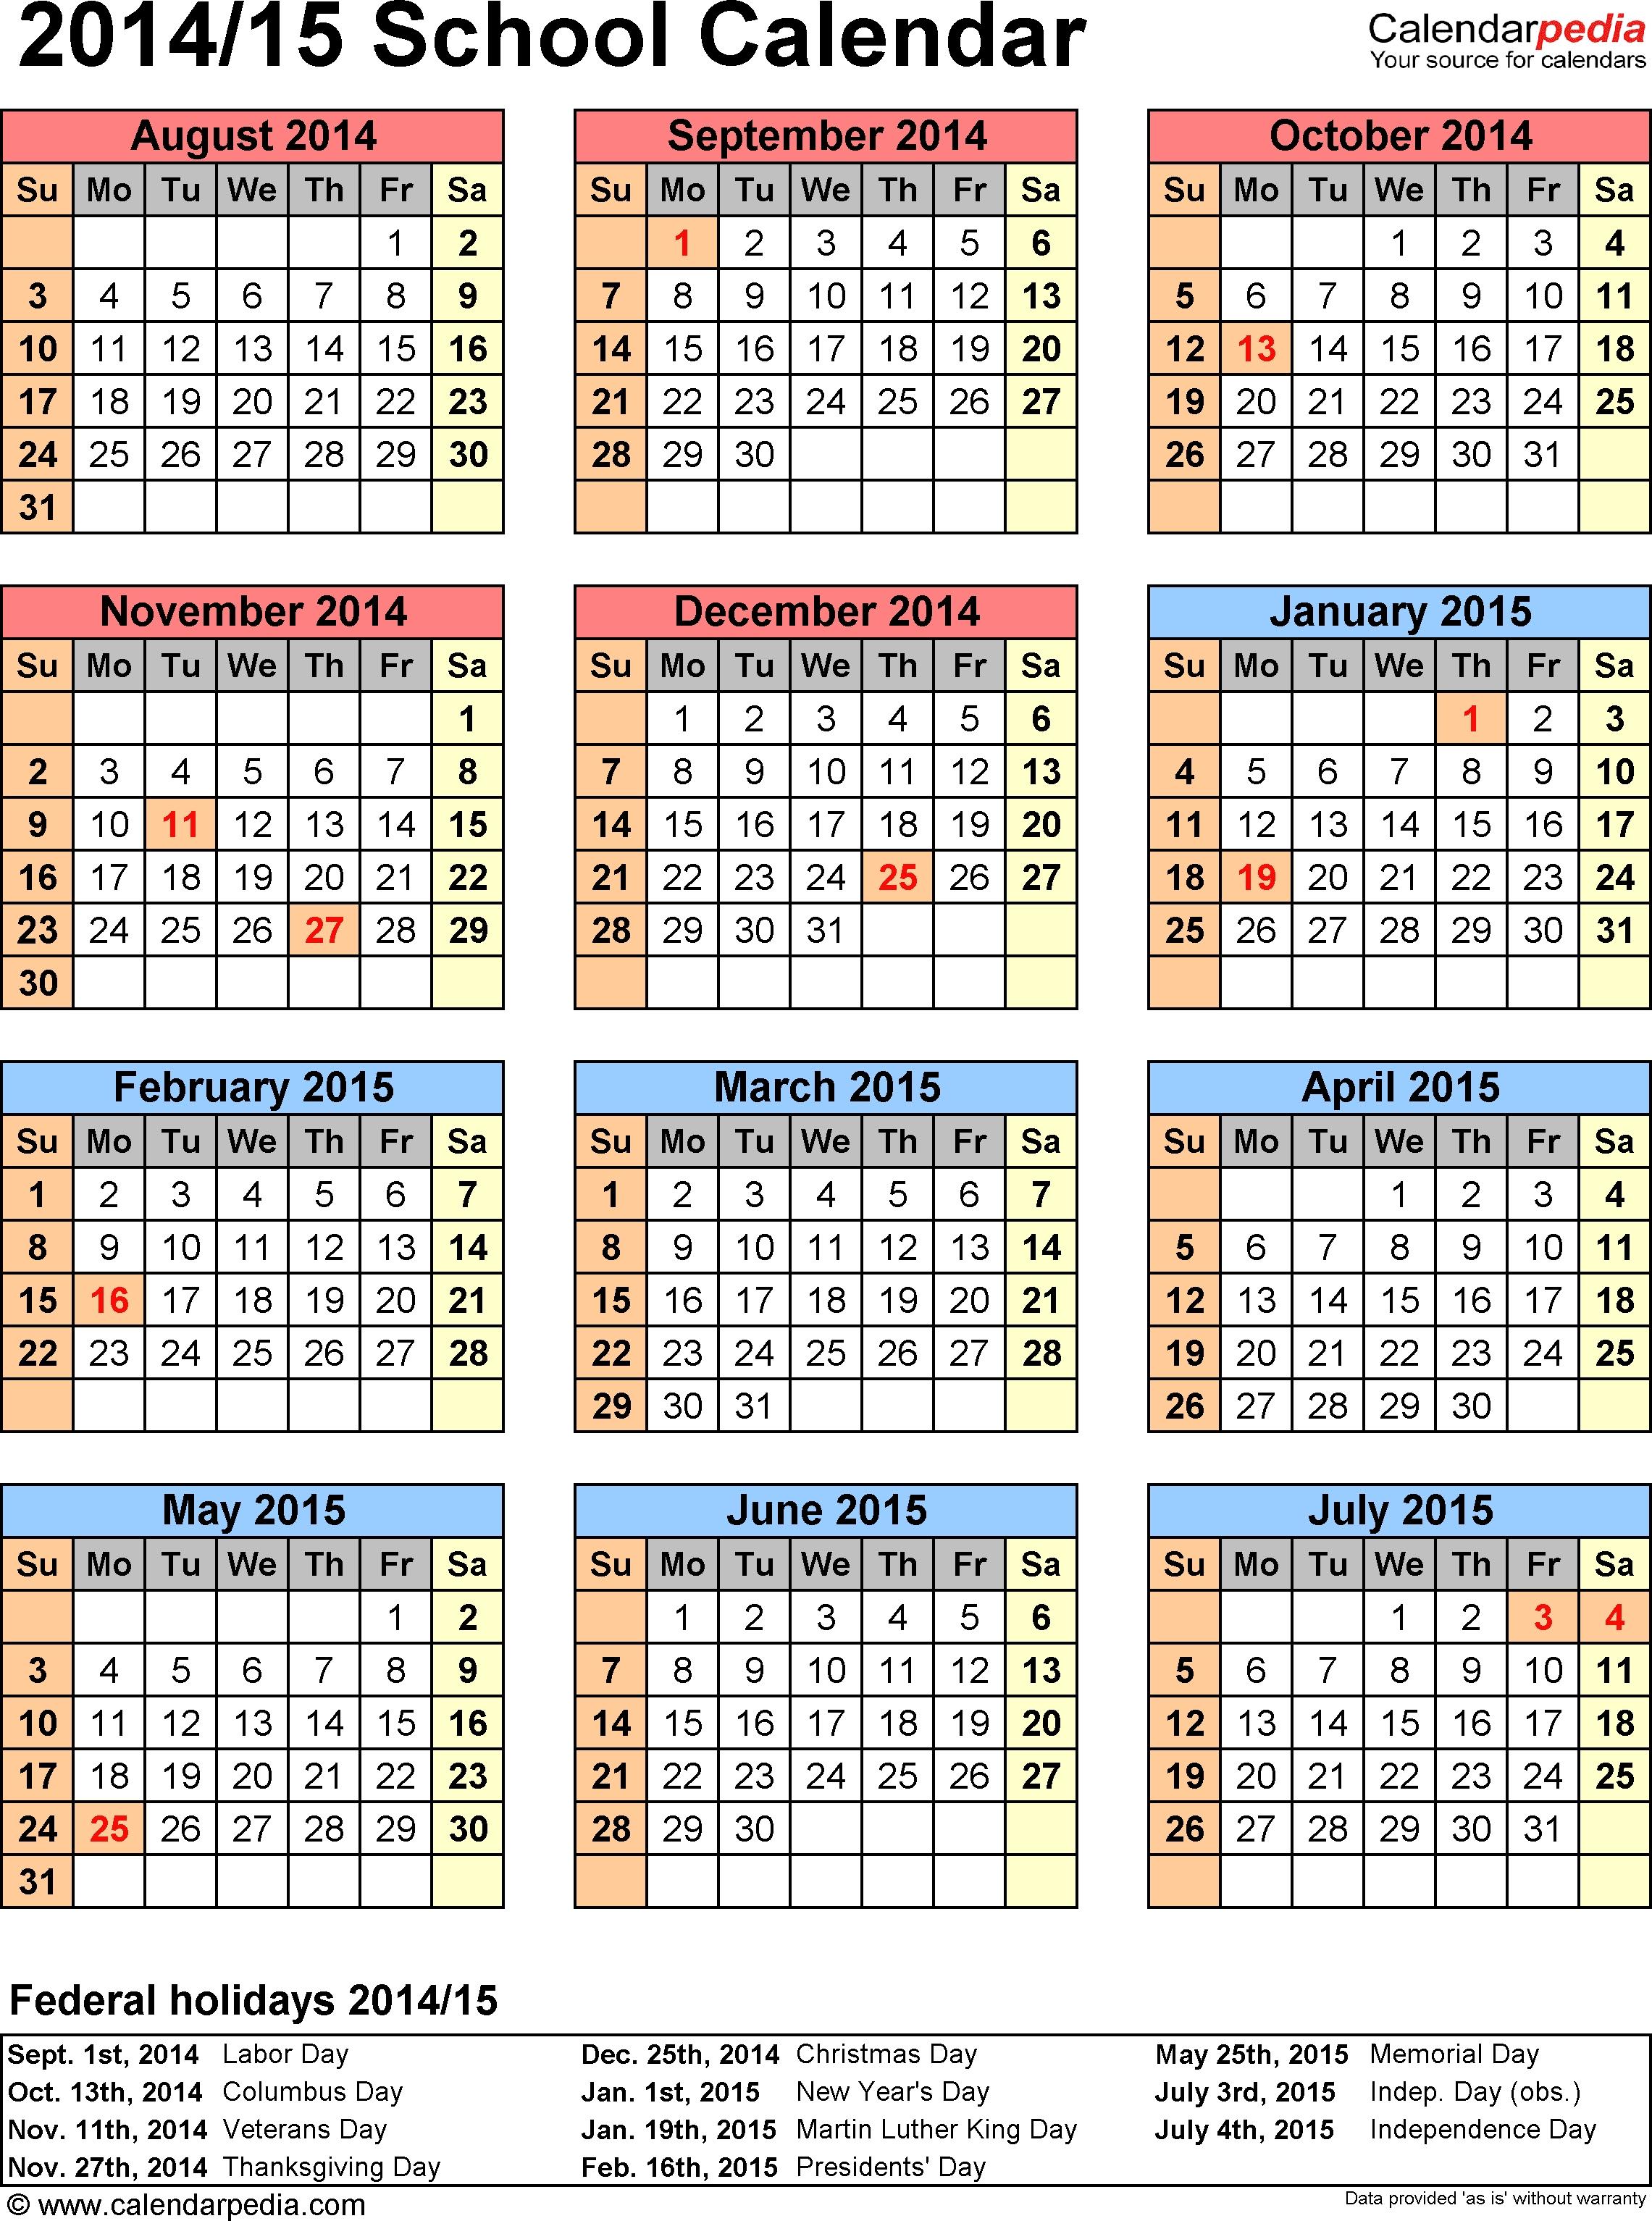 School Calendars 2014/2015 As Free Printable Word Templates pertaining to 5 School Day Calendar Blank